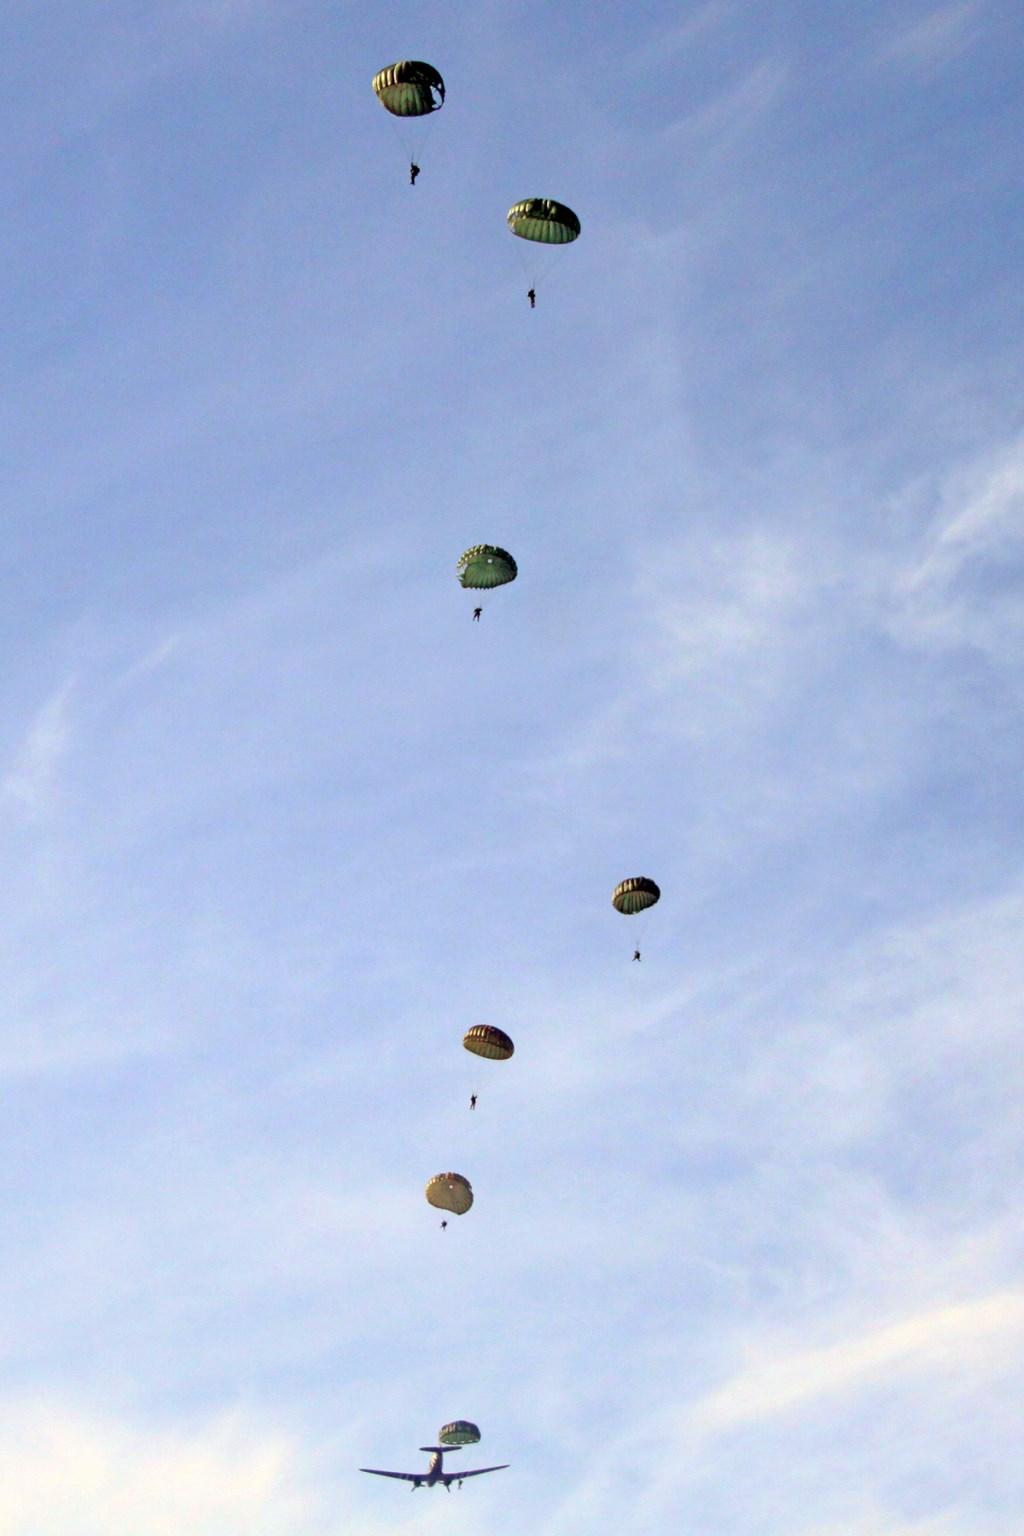 Foto: Lars Schwachöfer / Parachute Group Holland © Persgroep